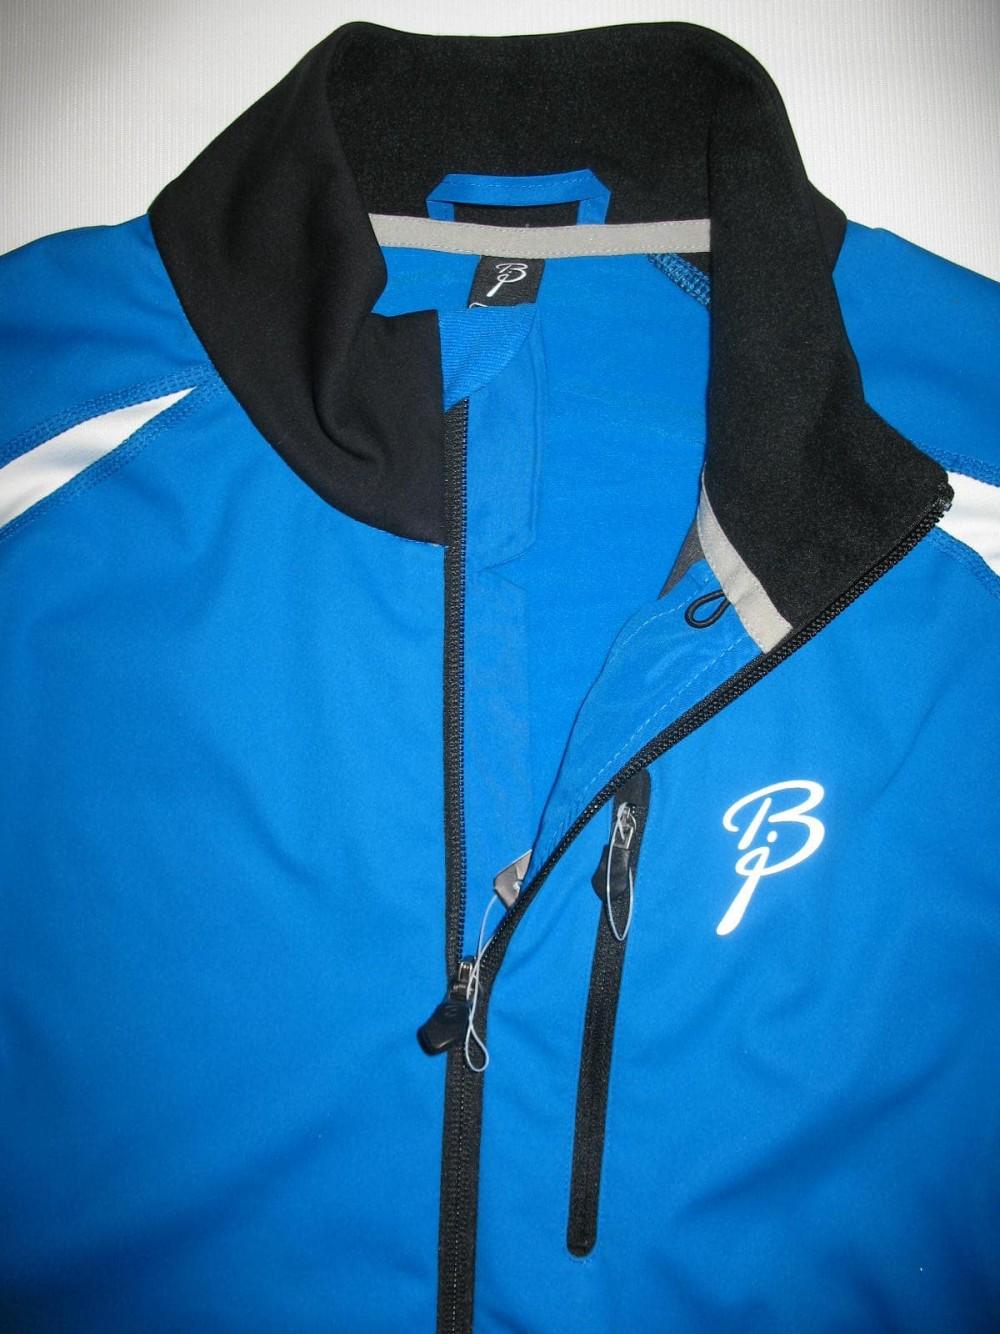 Куртка BJORN DAEHLIE by ODLO pace softshell jacket (размер XXL) - 4